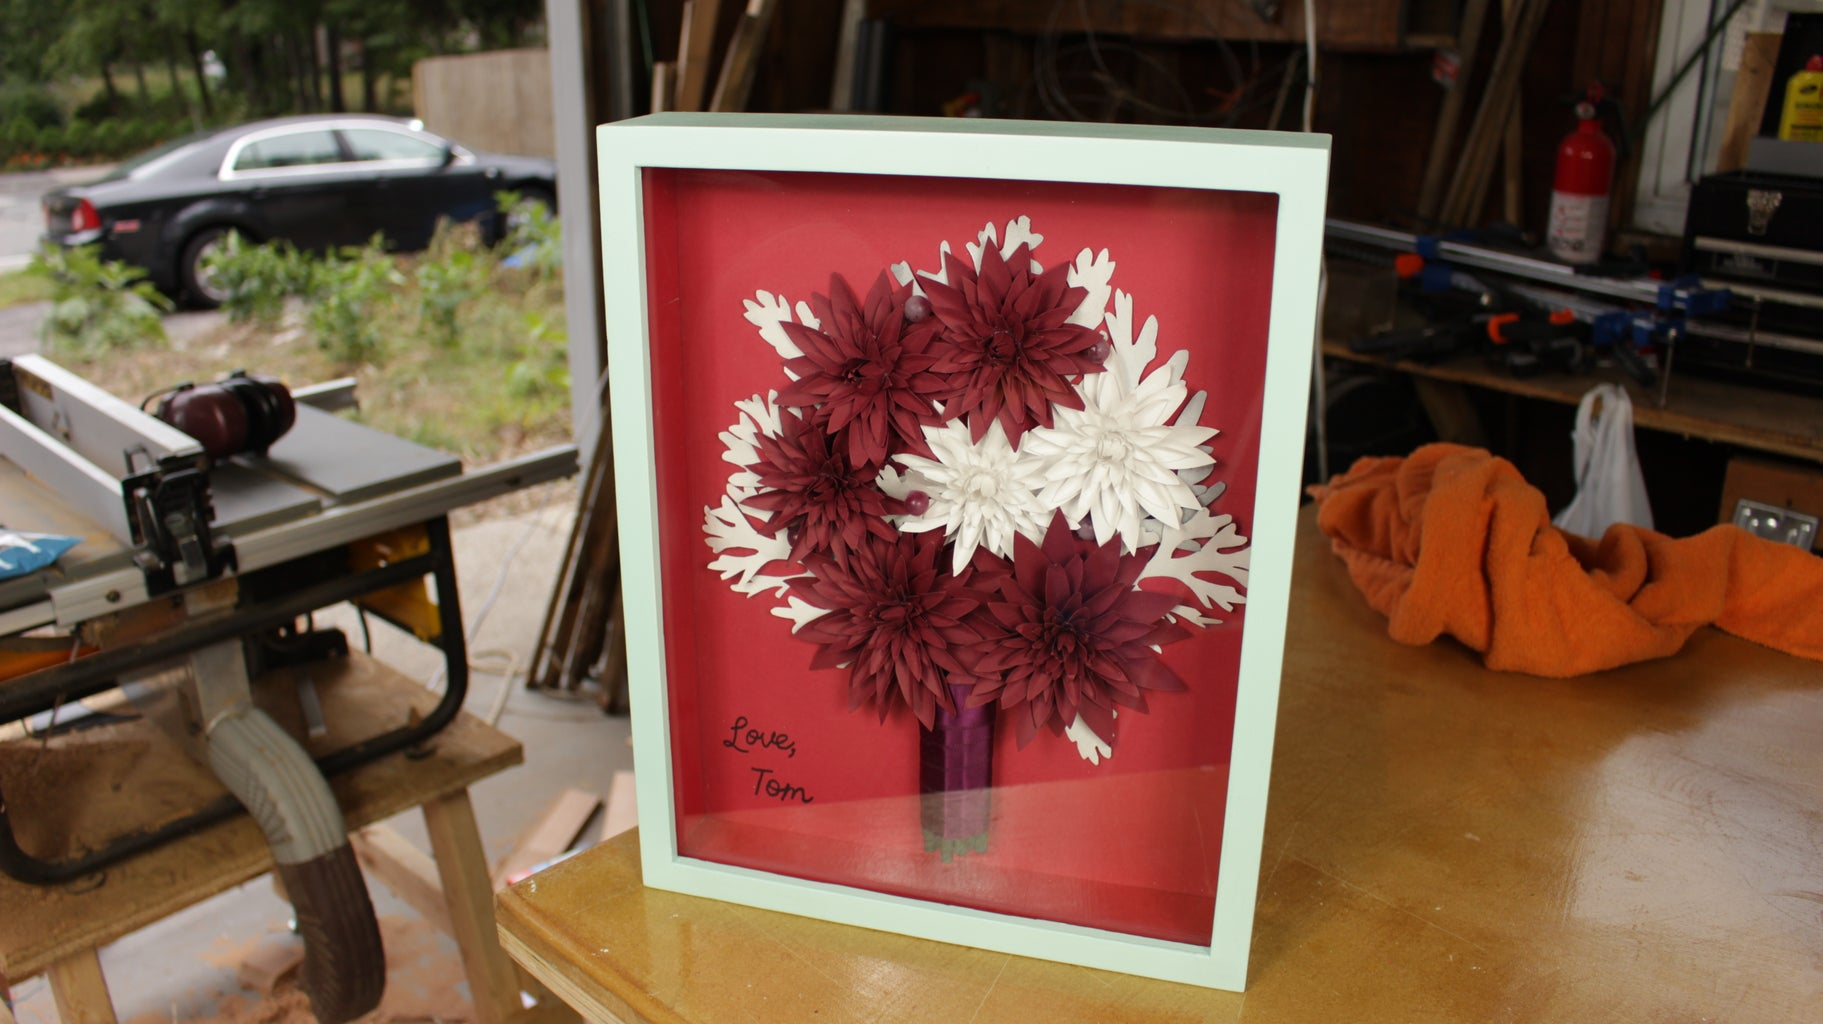 Classic 1st Anniversary Gift, Paper Flowers